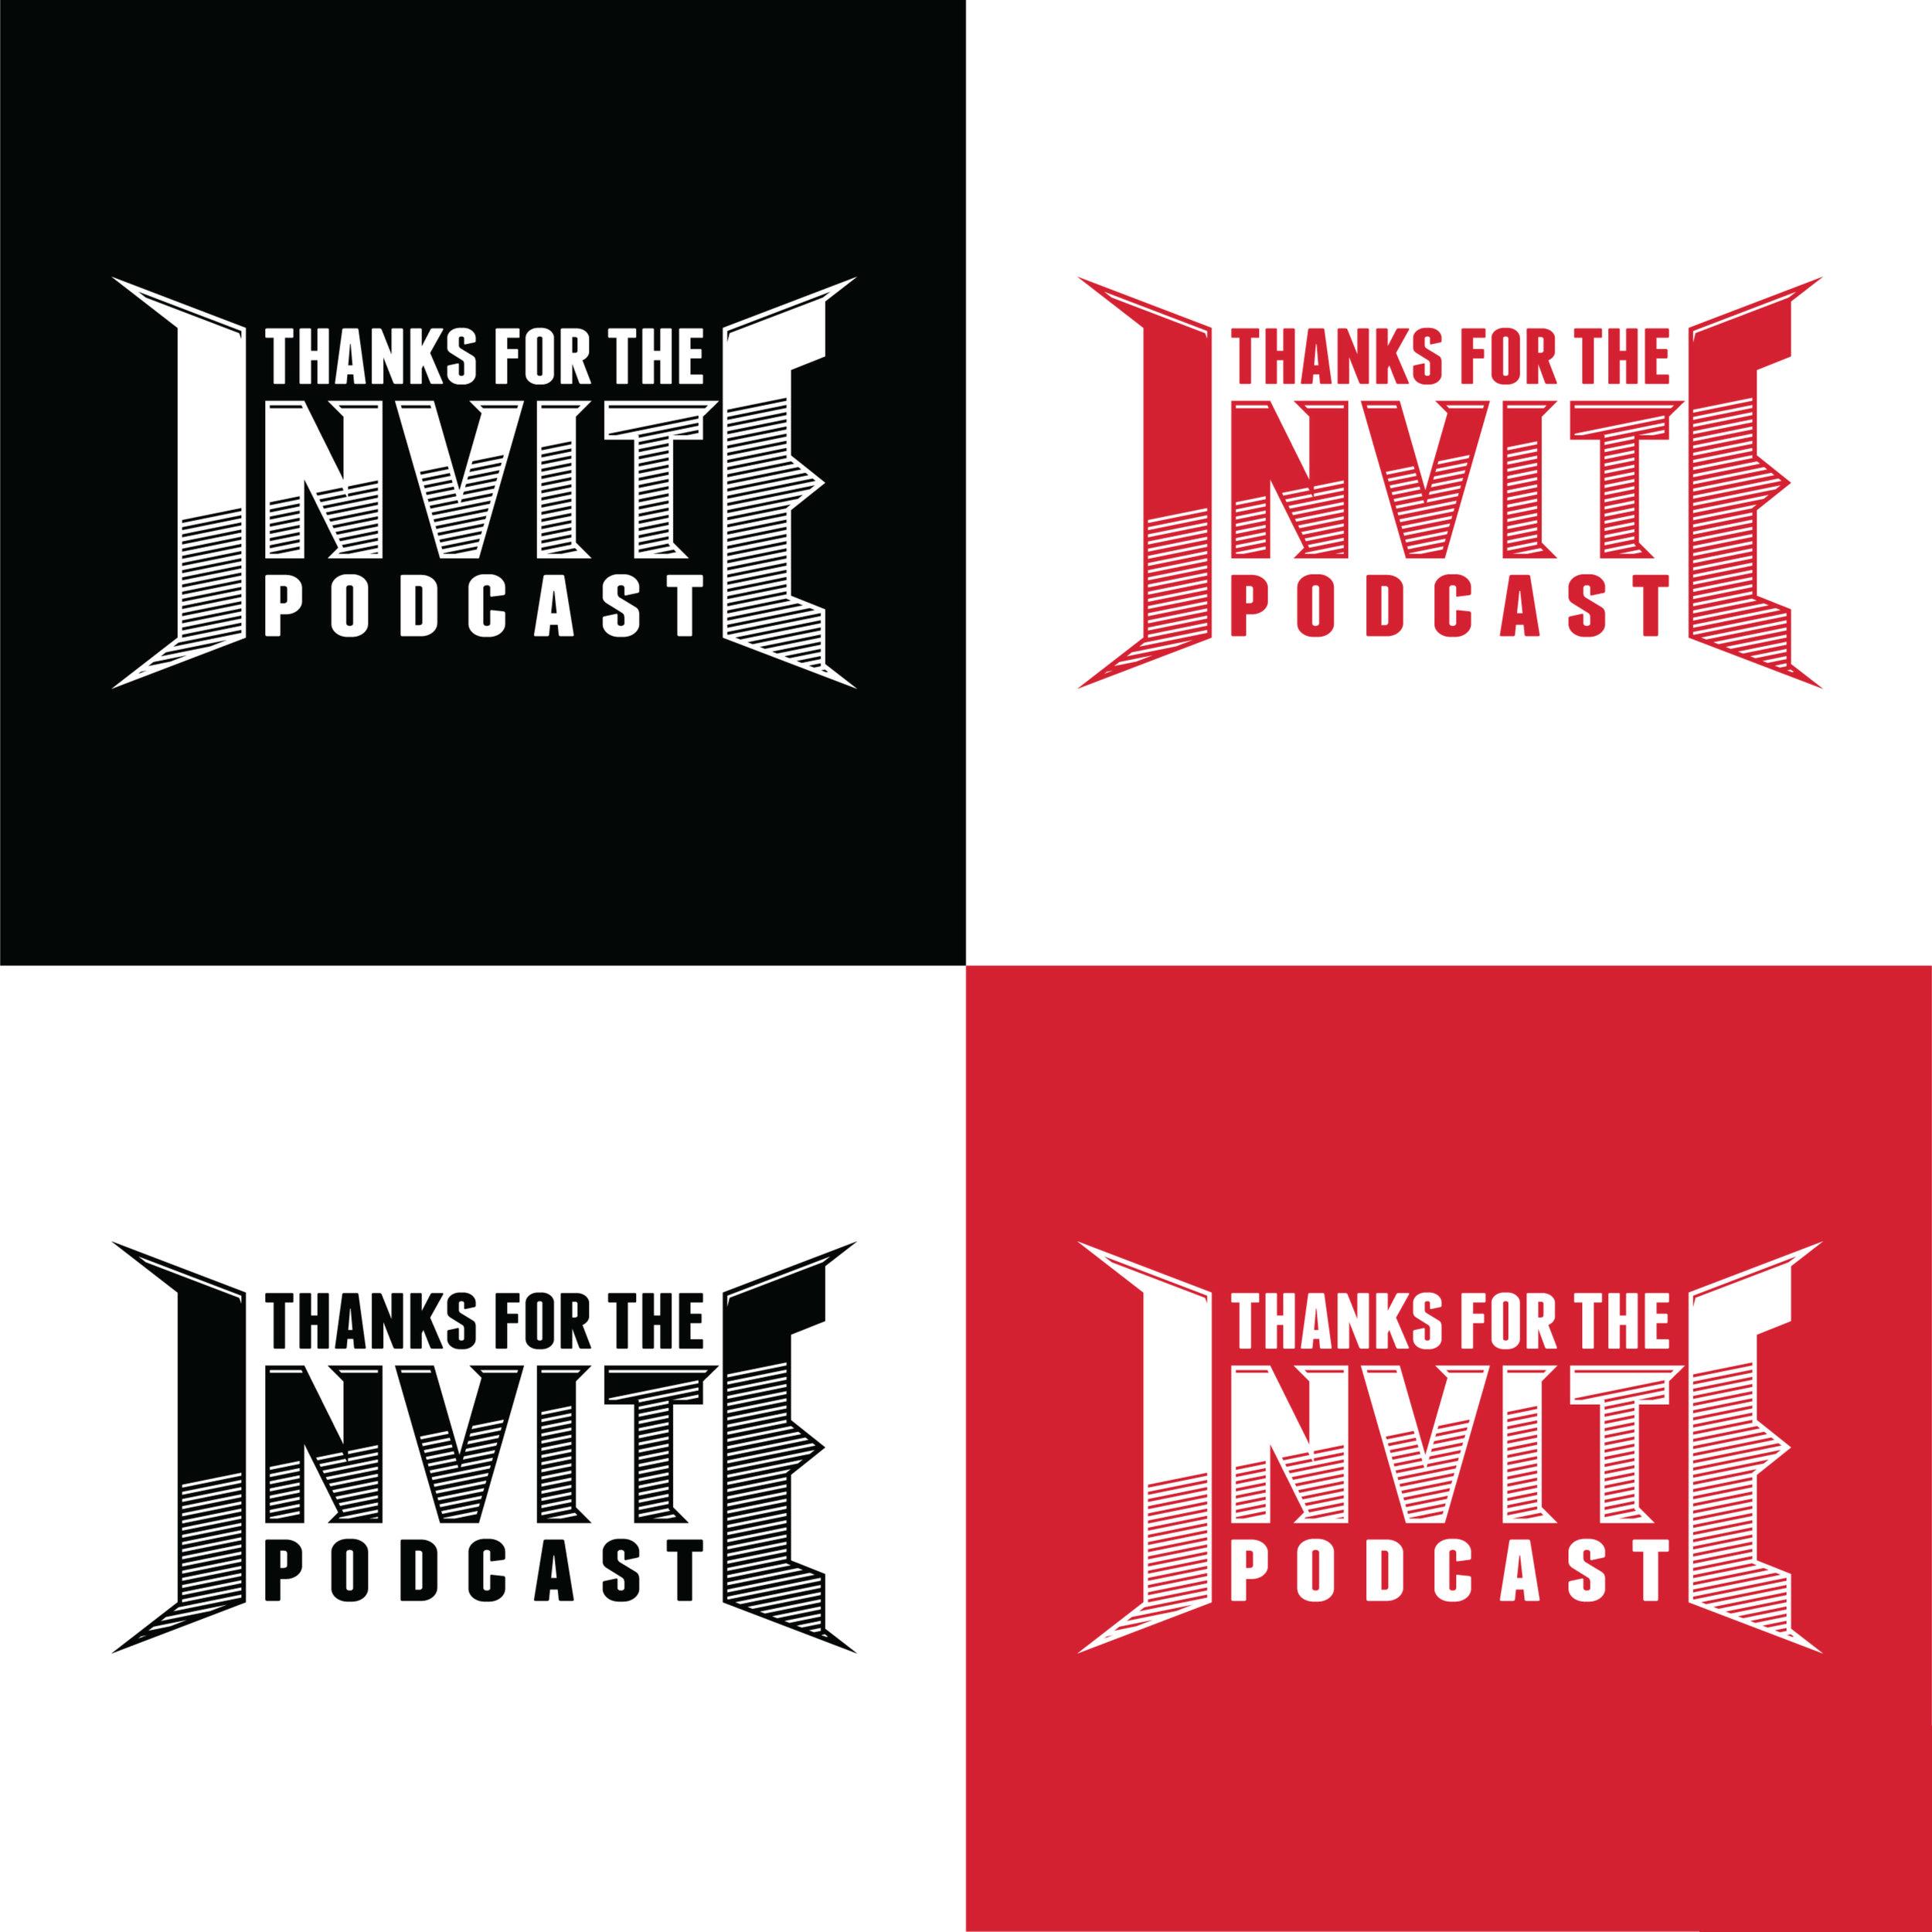 tfti-vector-logo-type-podcast-ape-colors.jpg